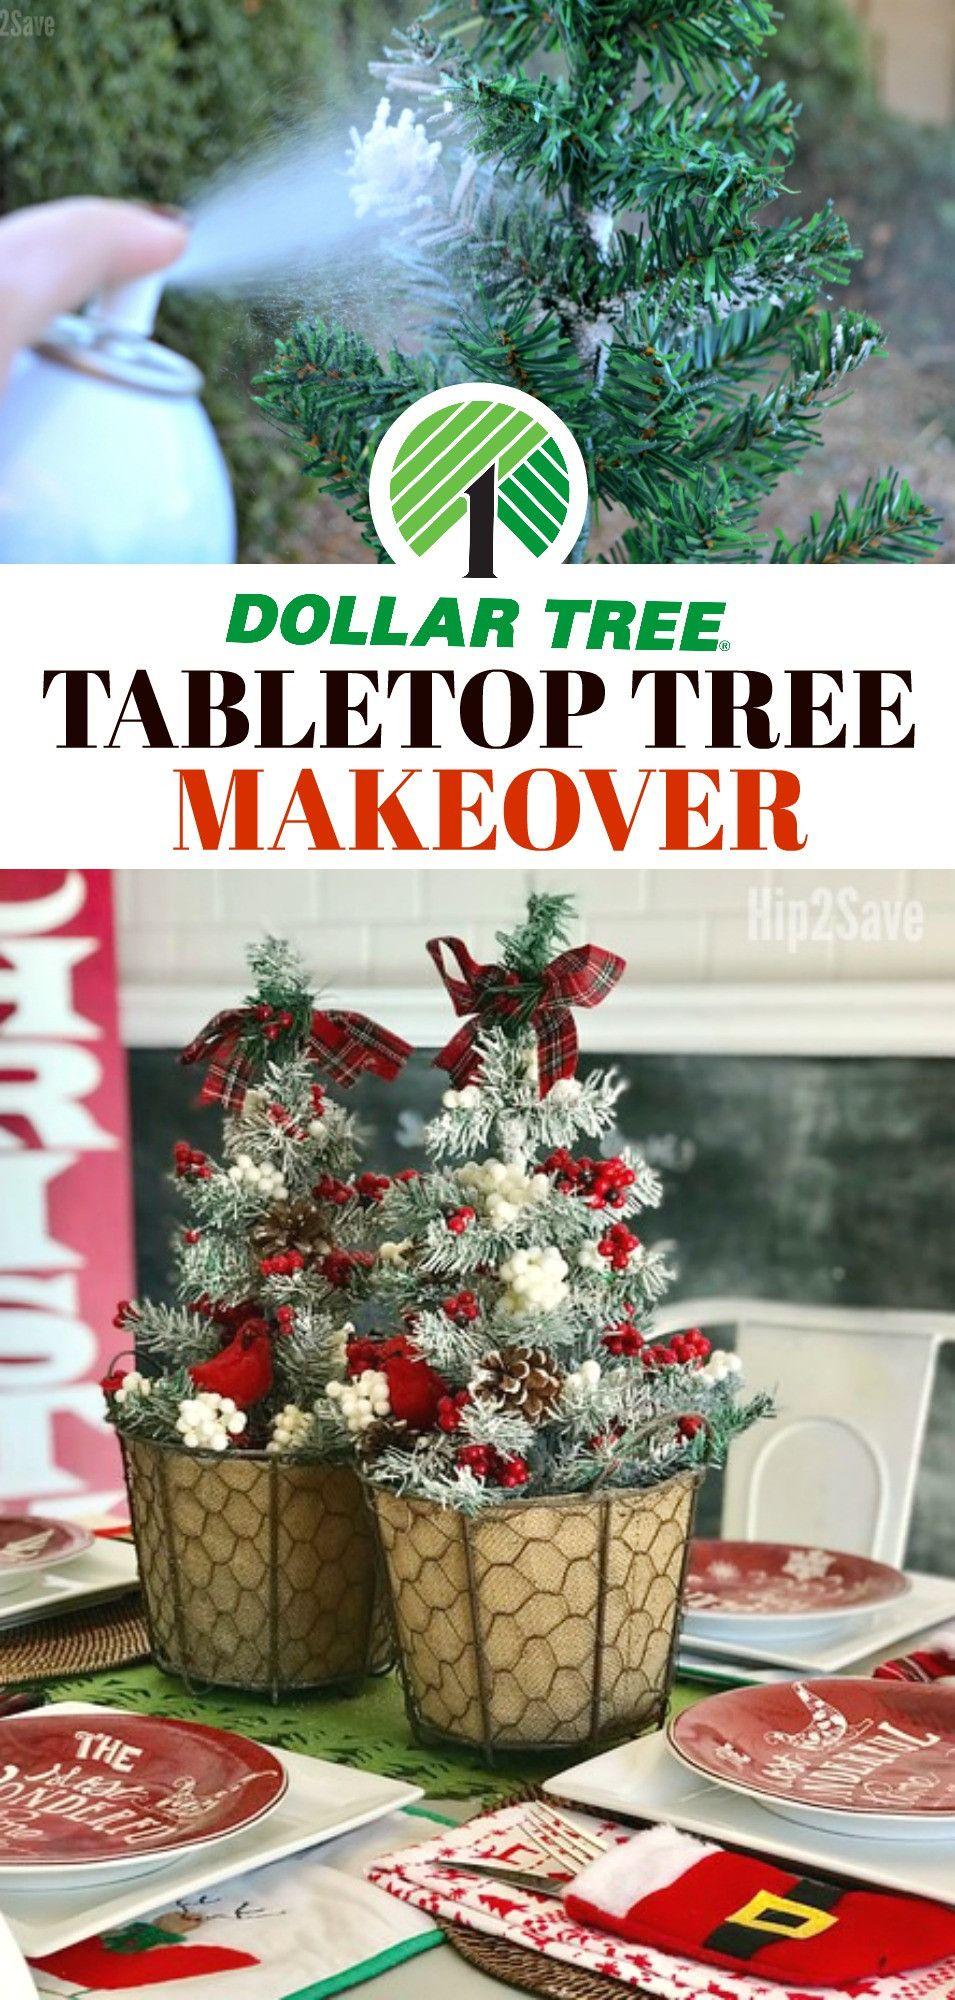 Turn This Dollar Tree Bargain into Stylish Christmas Decor #dollarstorechristmascrafts